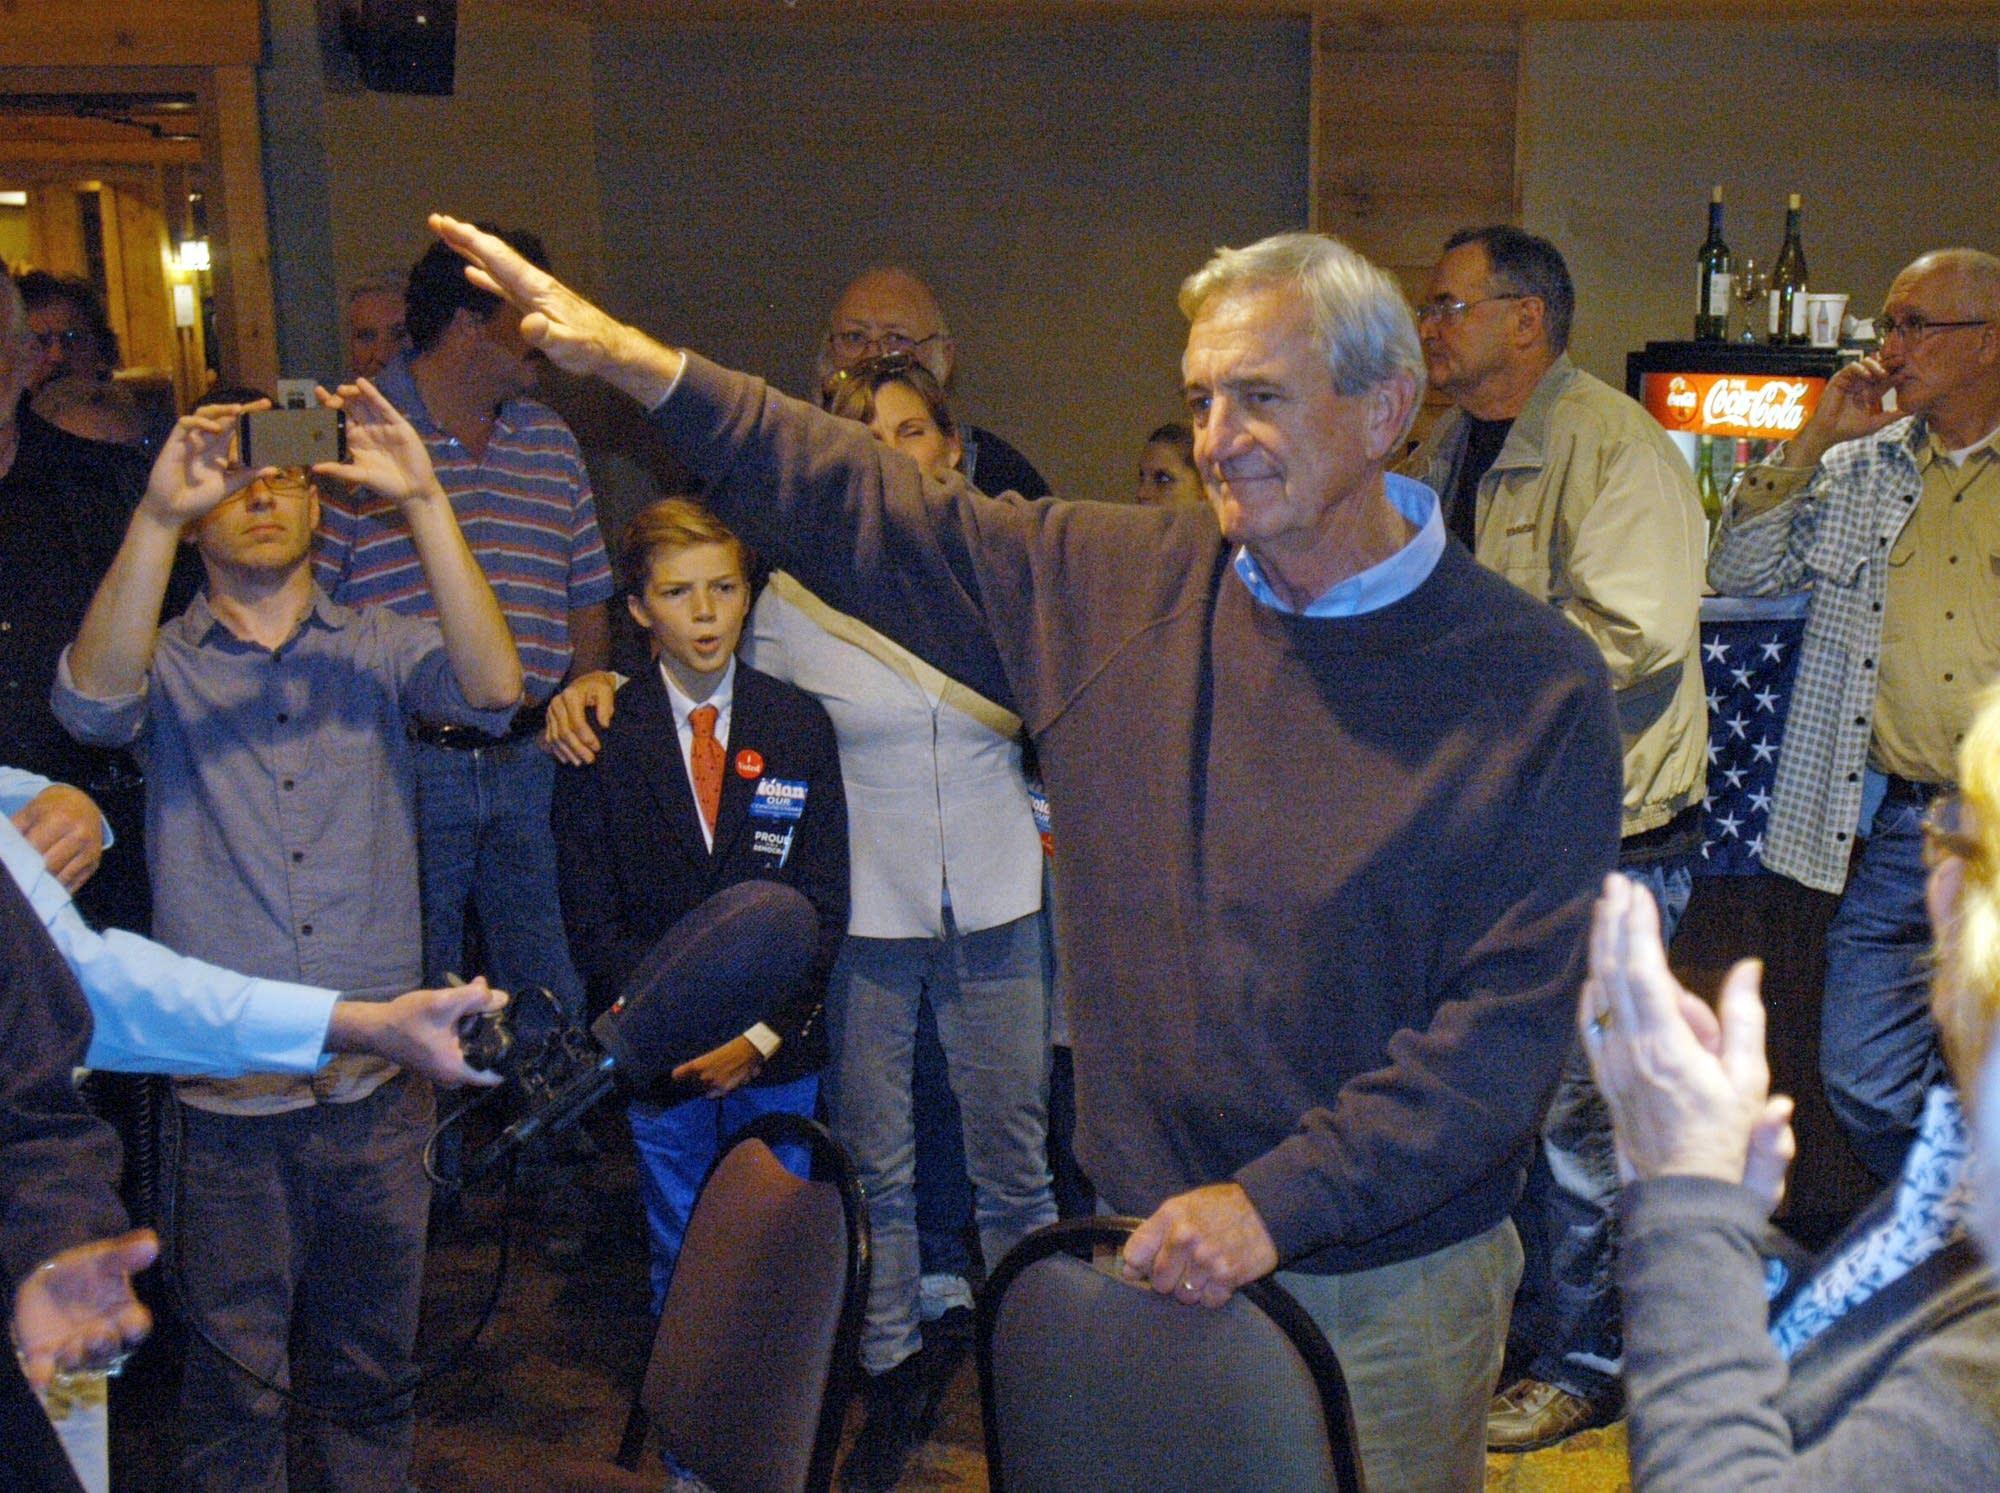 Rep. Rick Nolan addresses supporters.